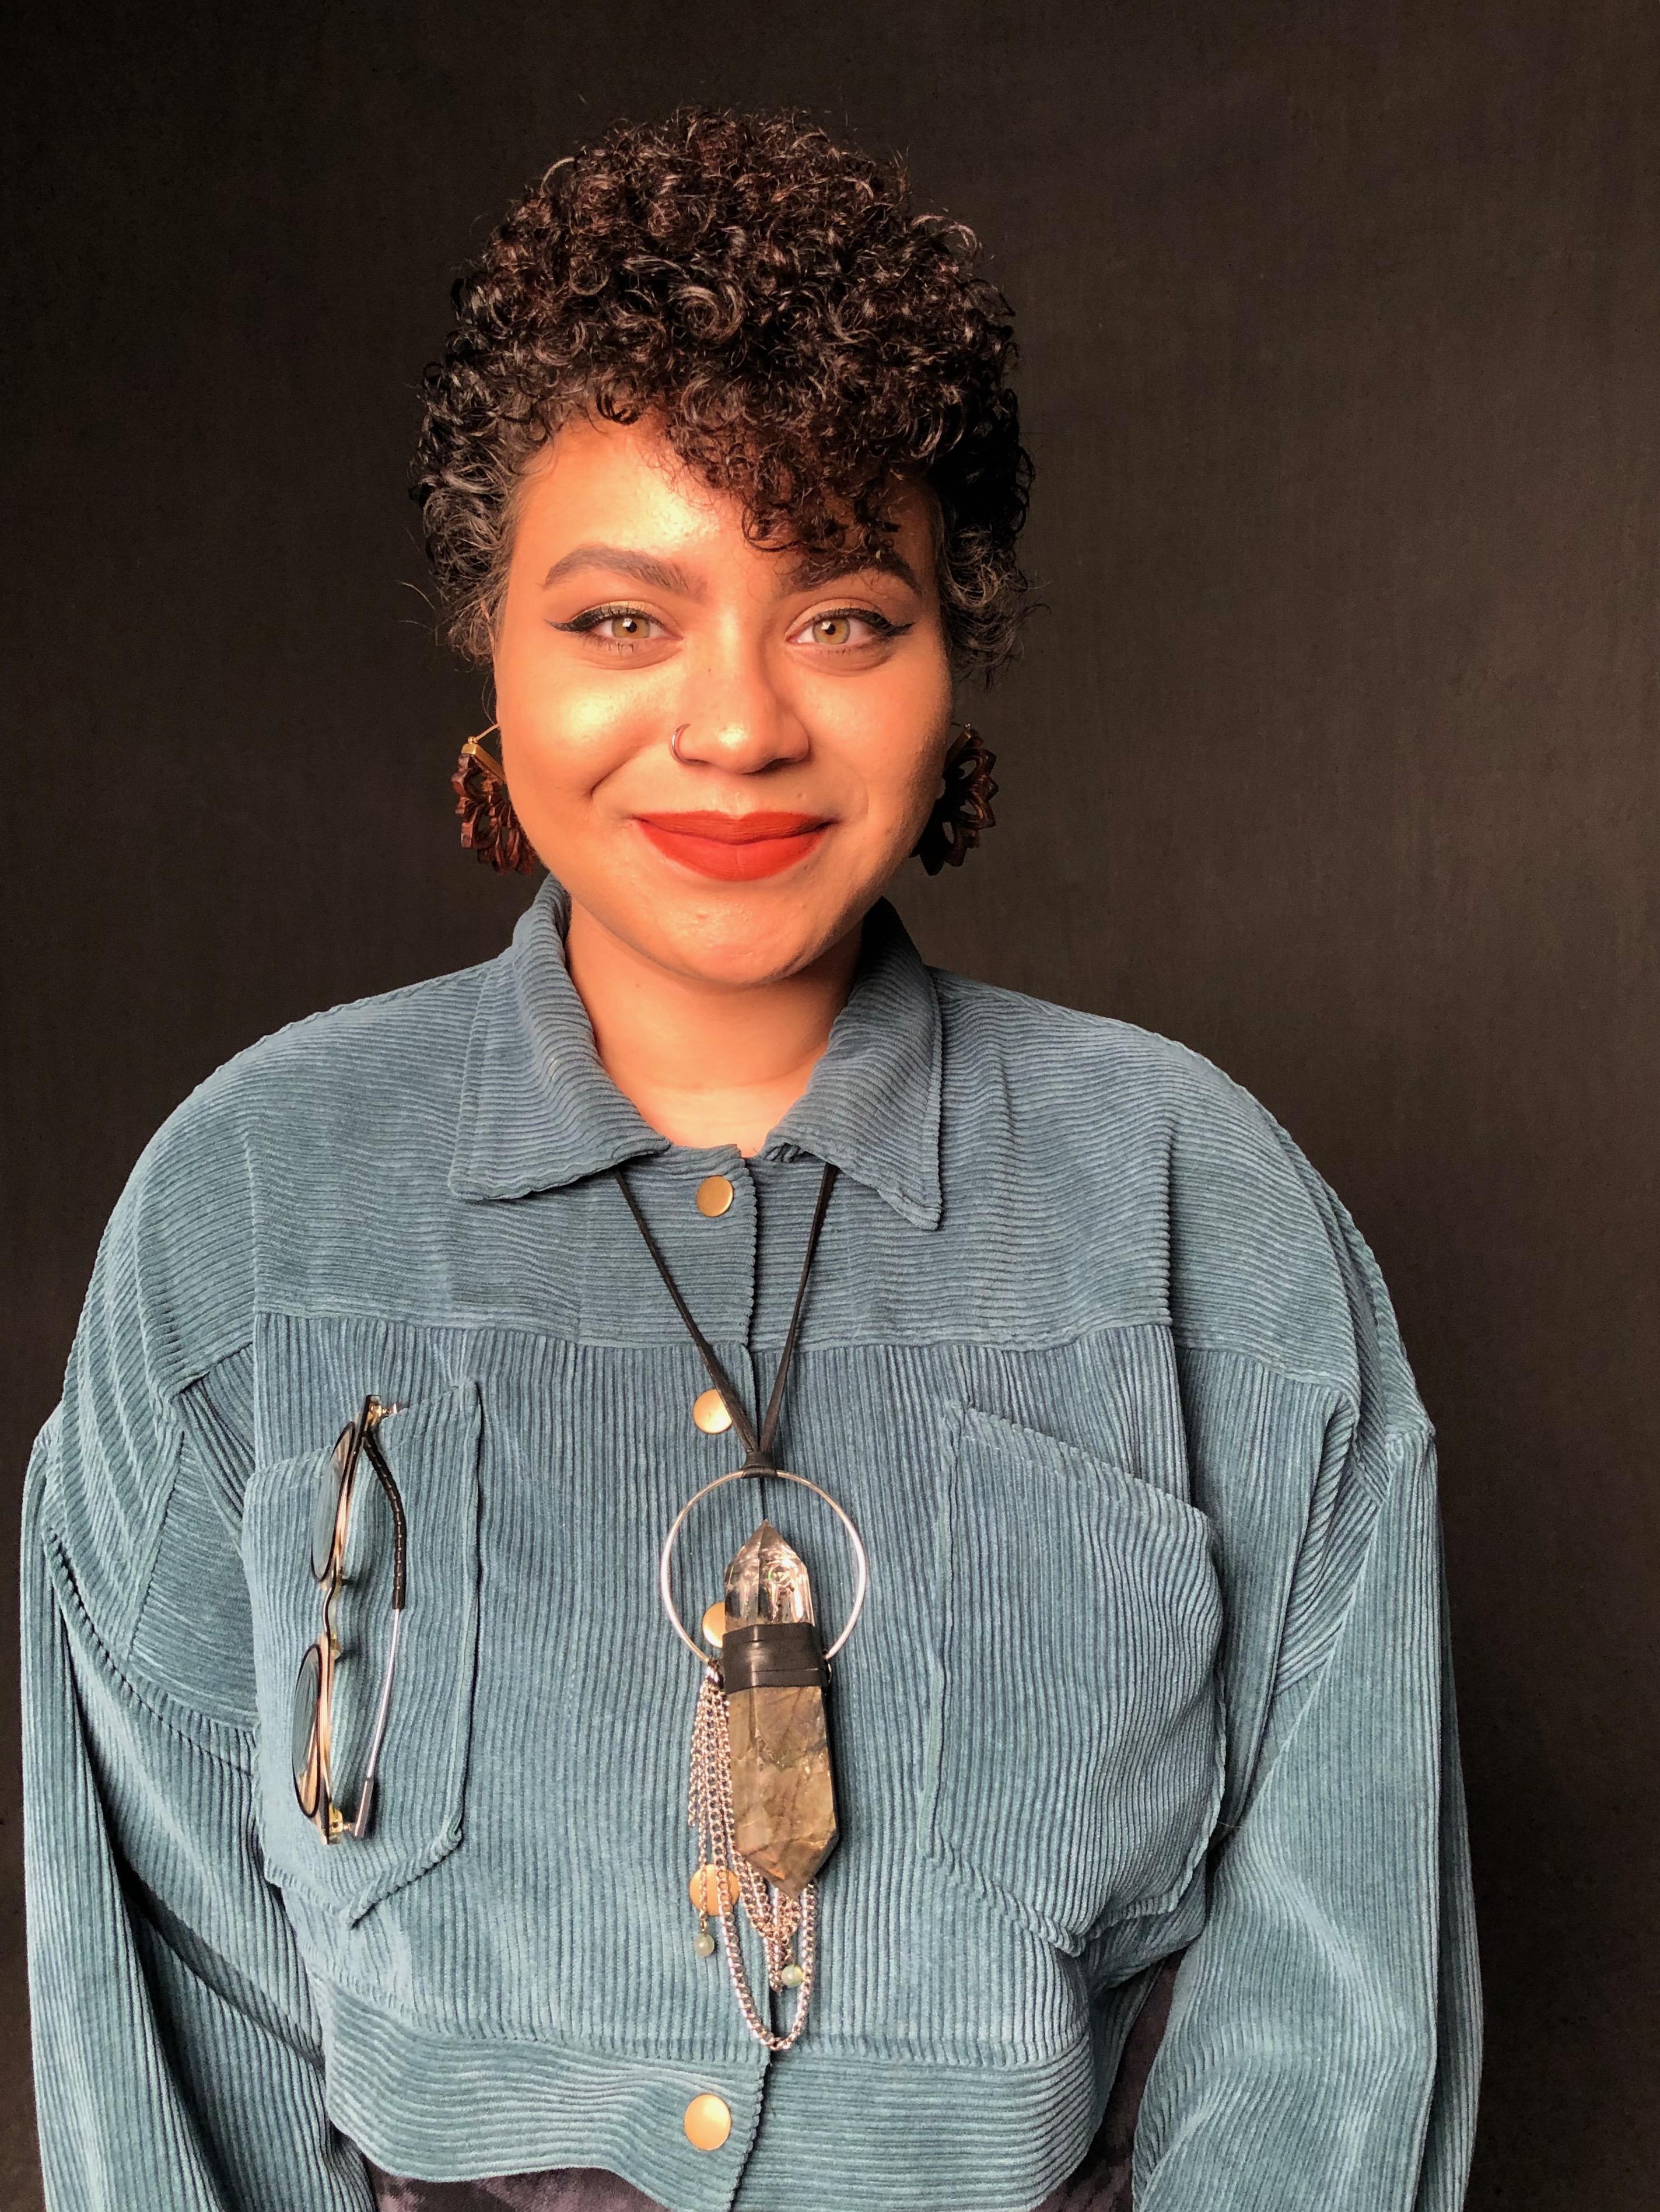 Live Art Exhibit: Darien Burress, WMU Student Artist-in-Residence